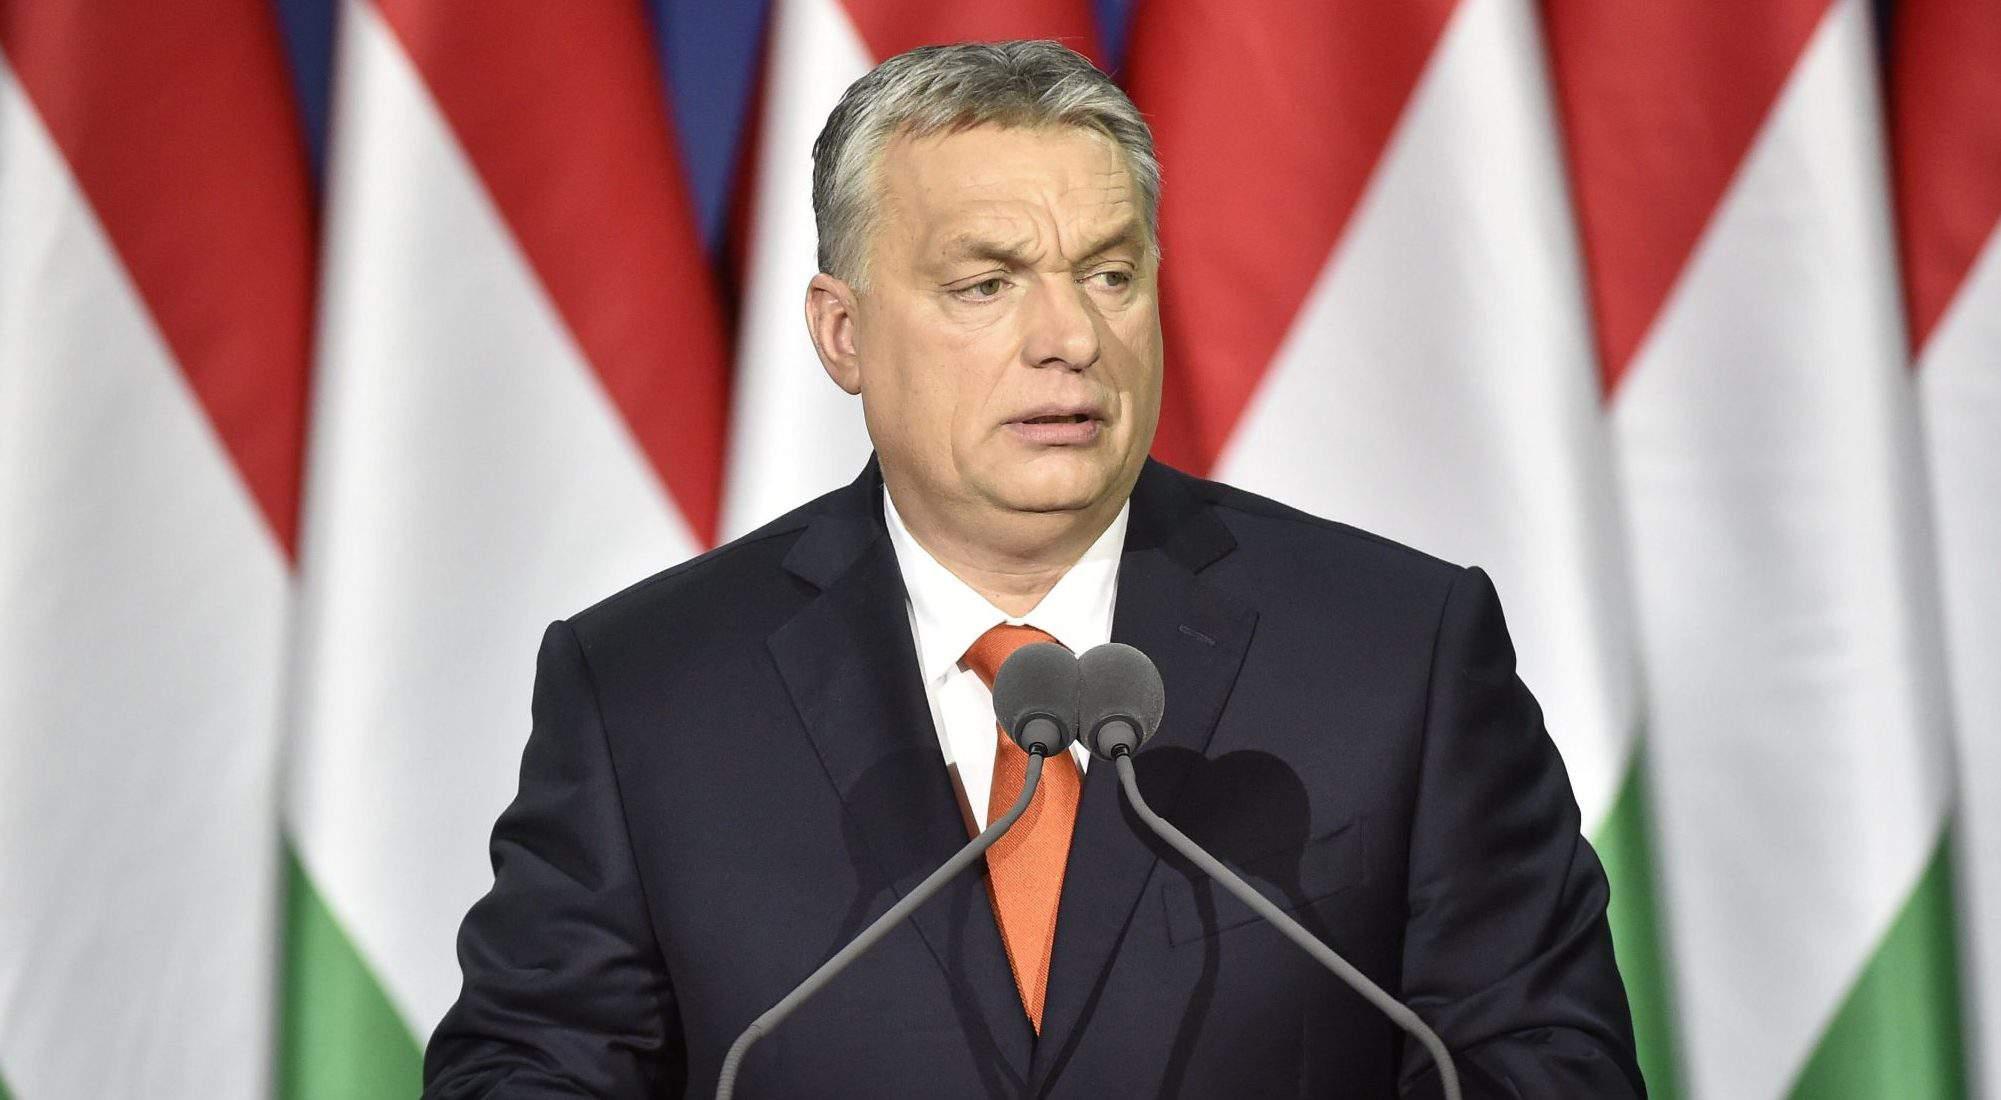 Hungary prime minister Orbán